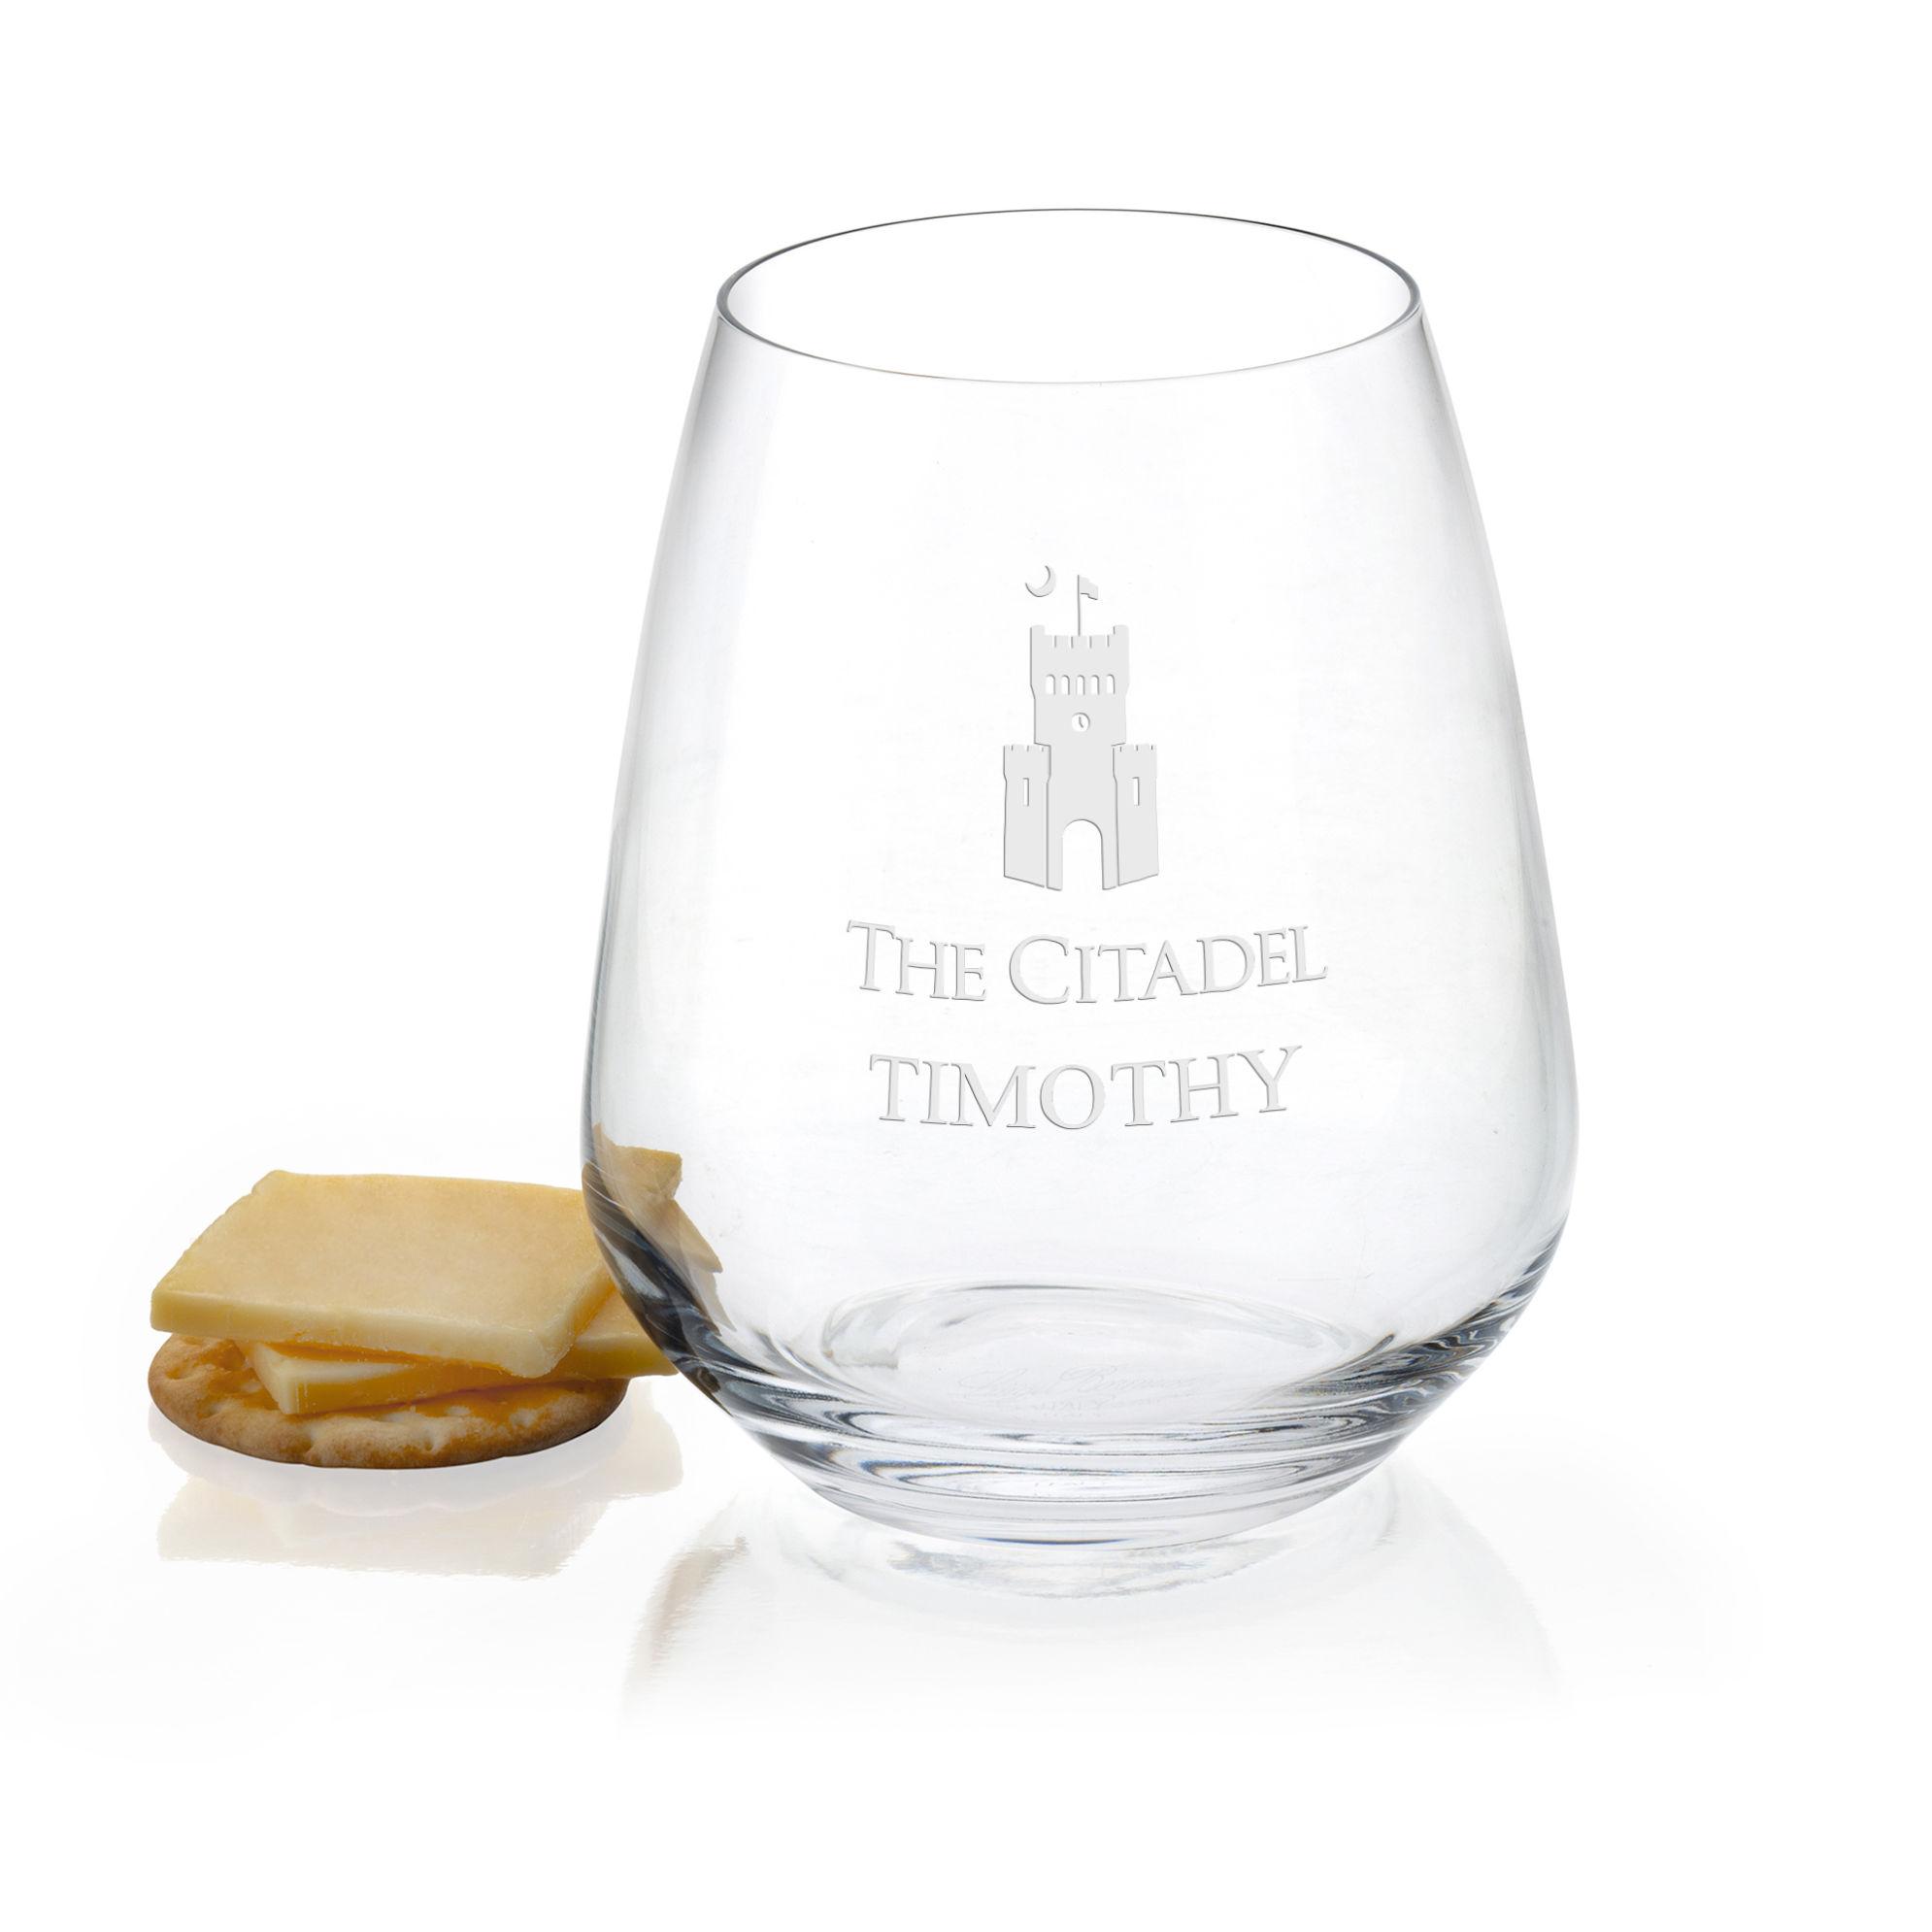 Citadel Stemless Wine Glasses - Set of 2